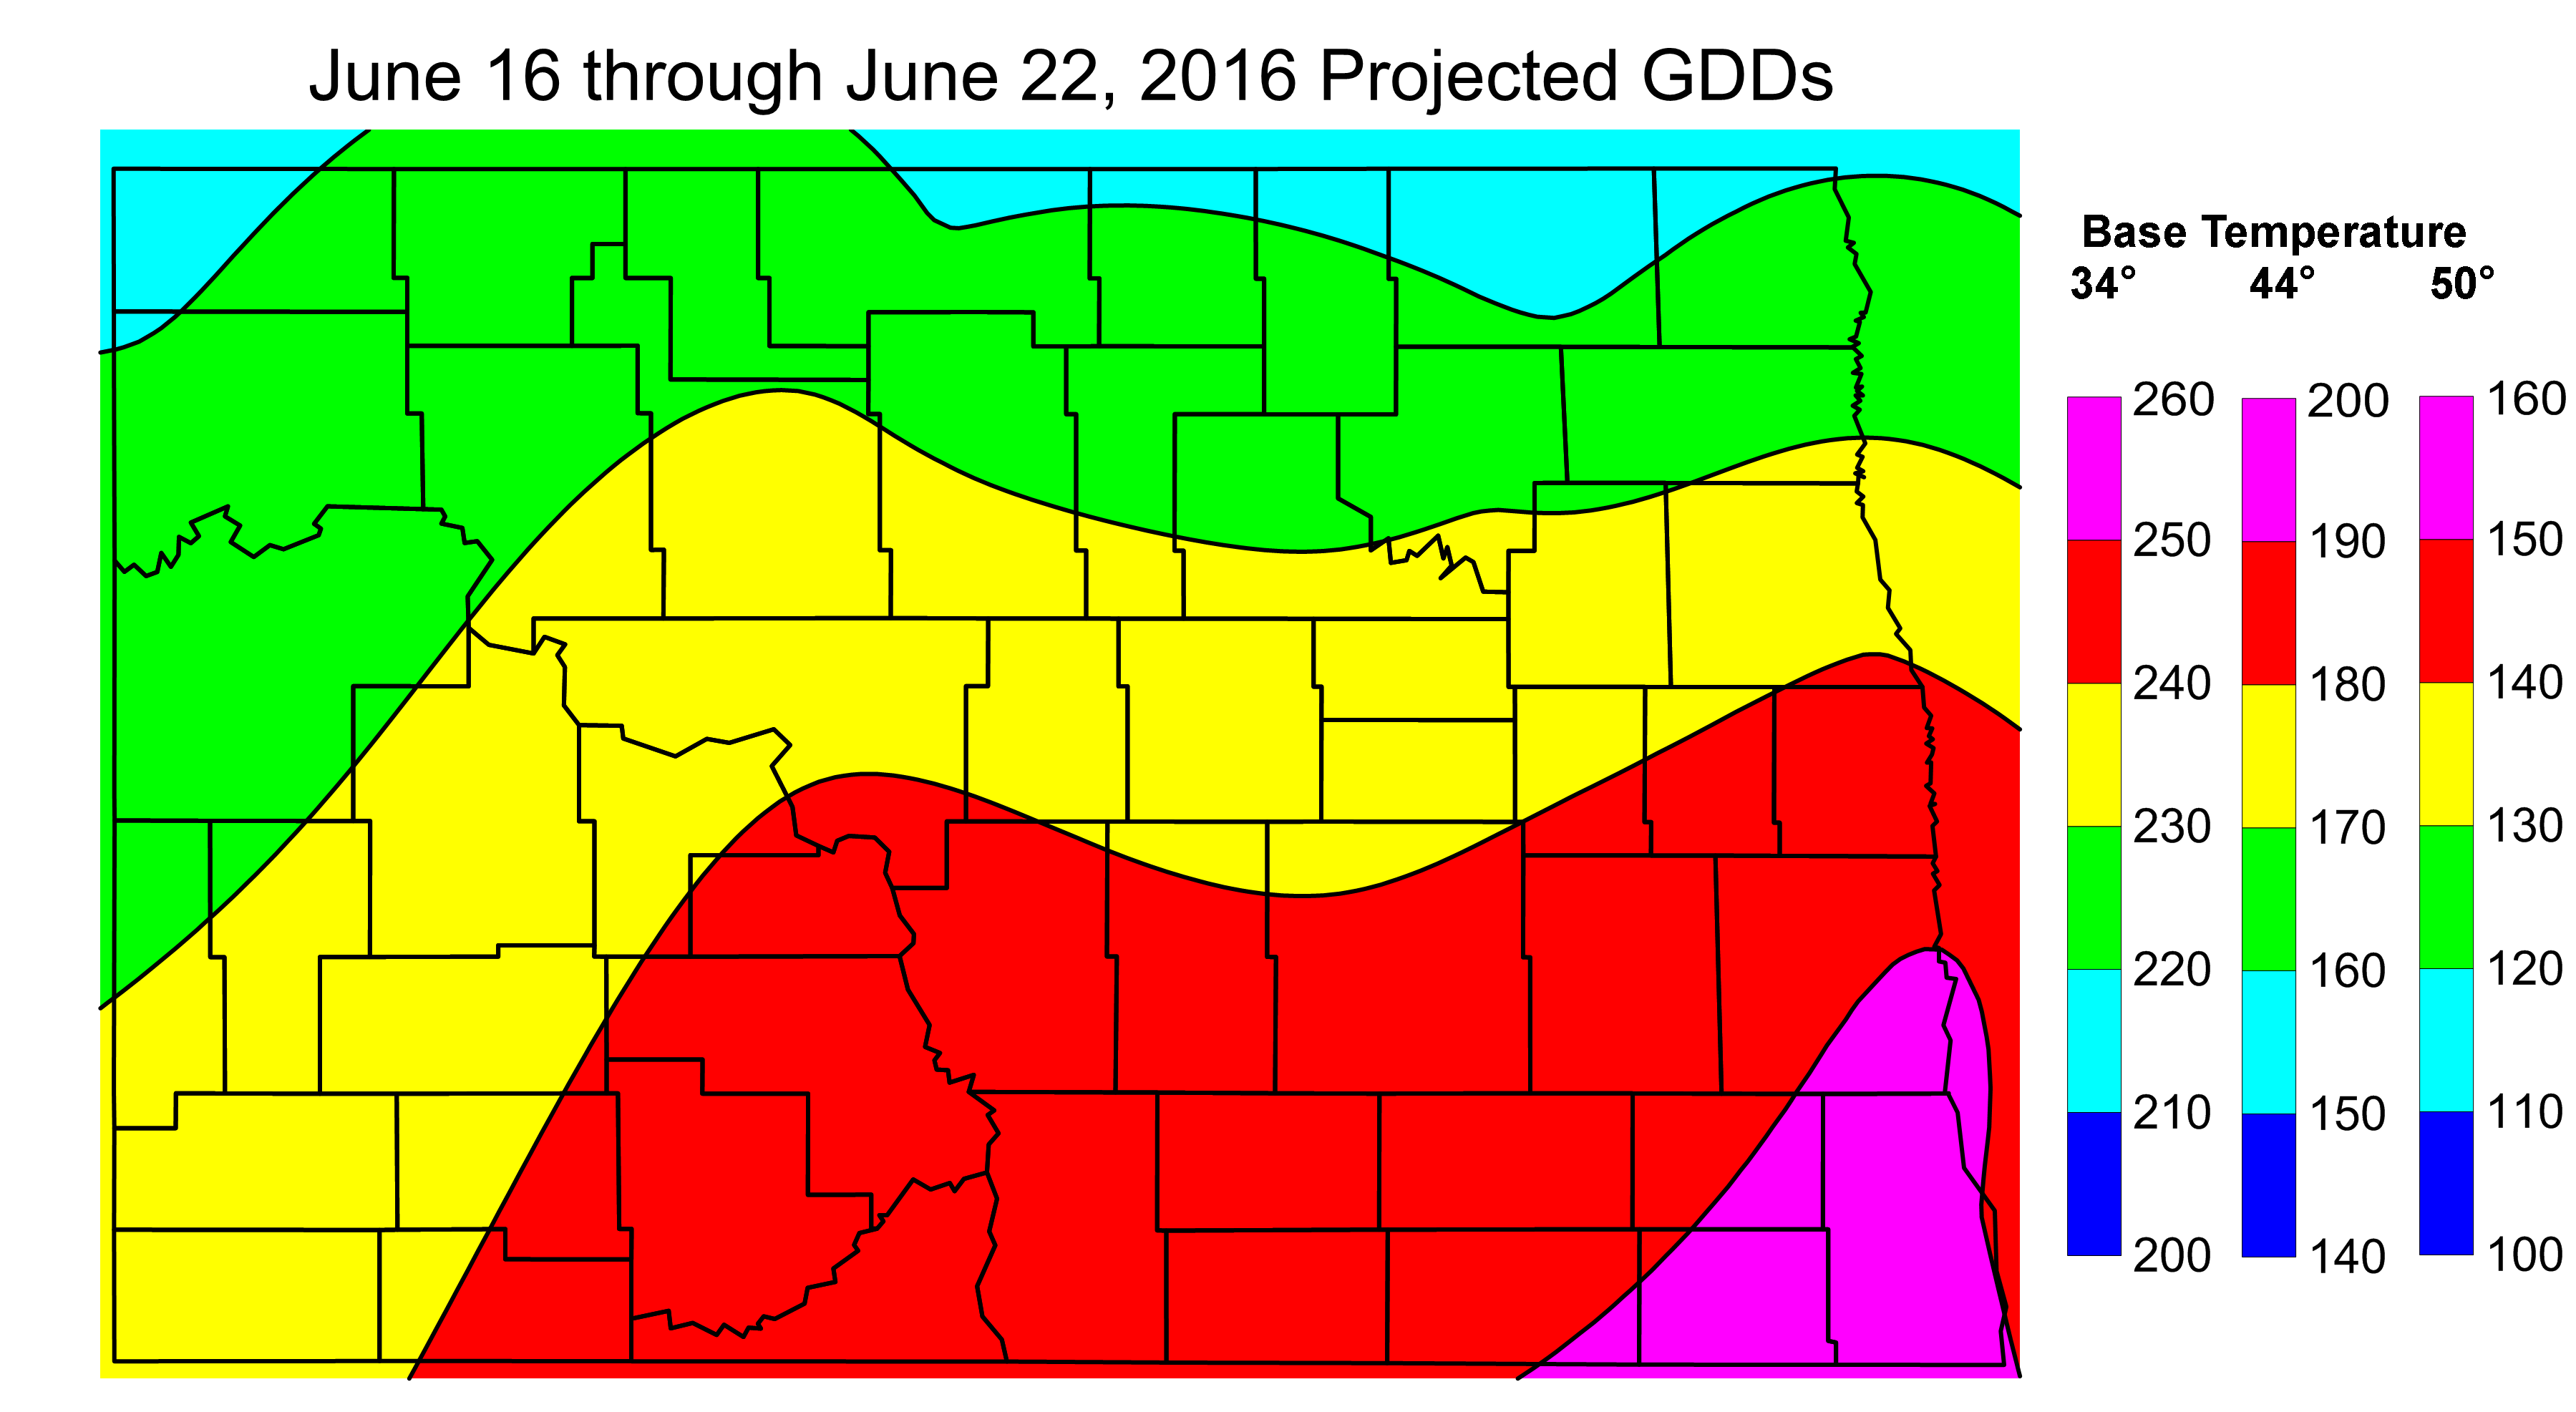 June 16-22, 2016 Estimated GDDs